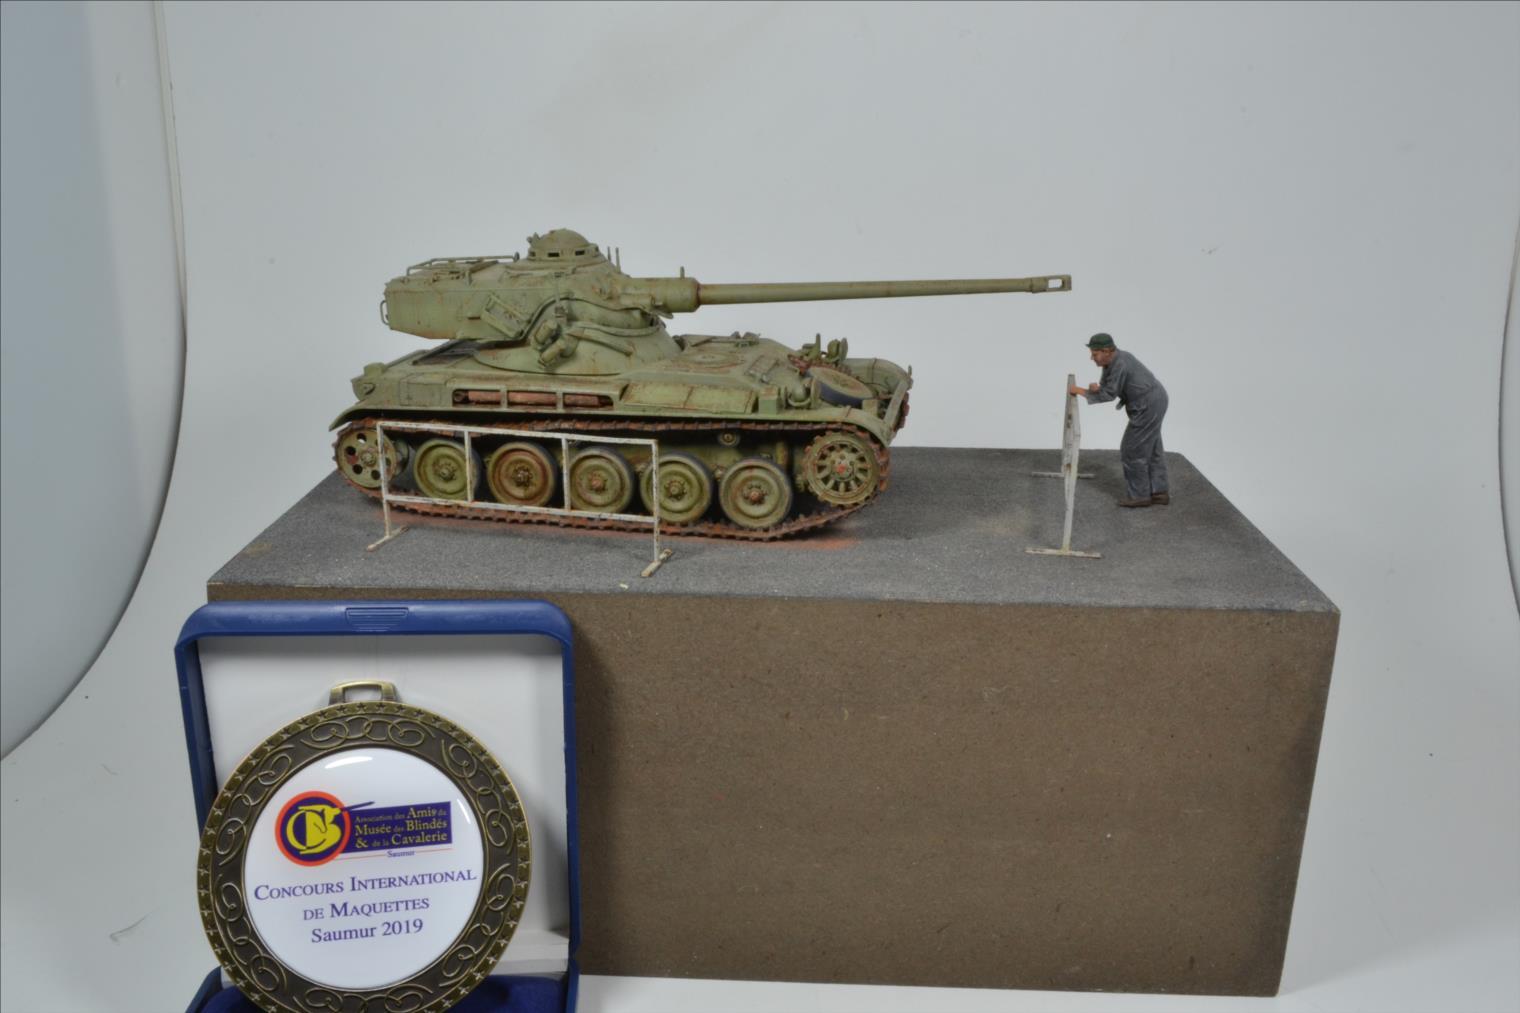 AMX 13 (Tamiya) 1/35 - Page 2 19061210391722494216272084